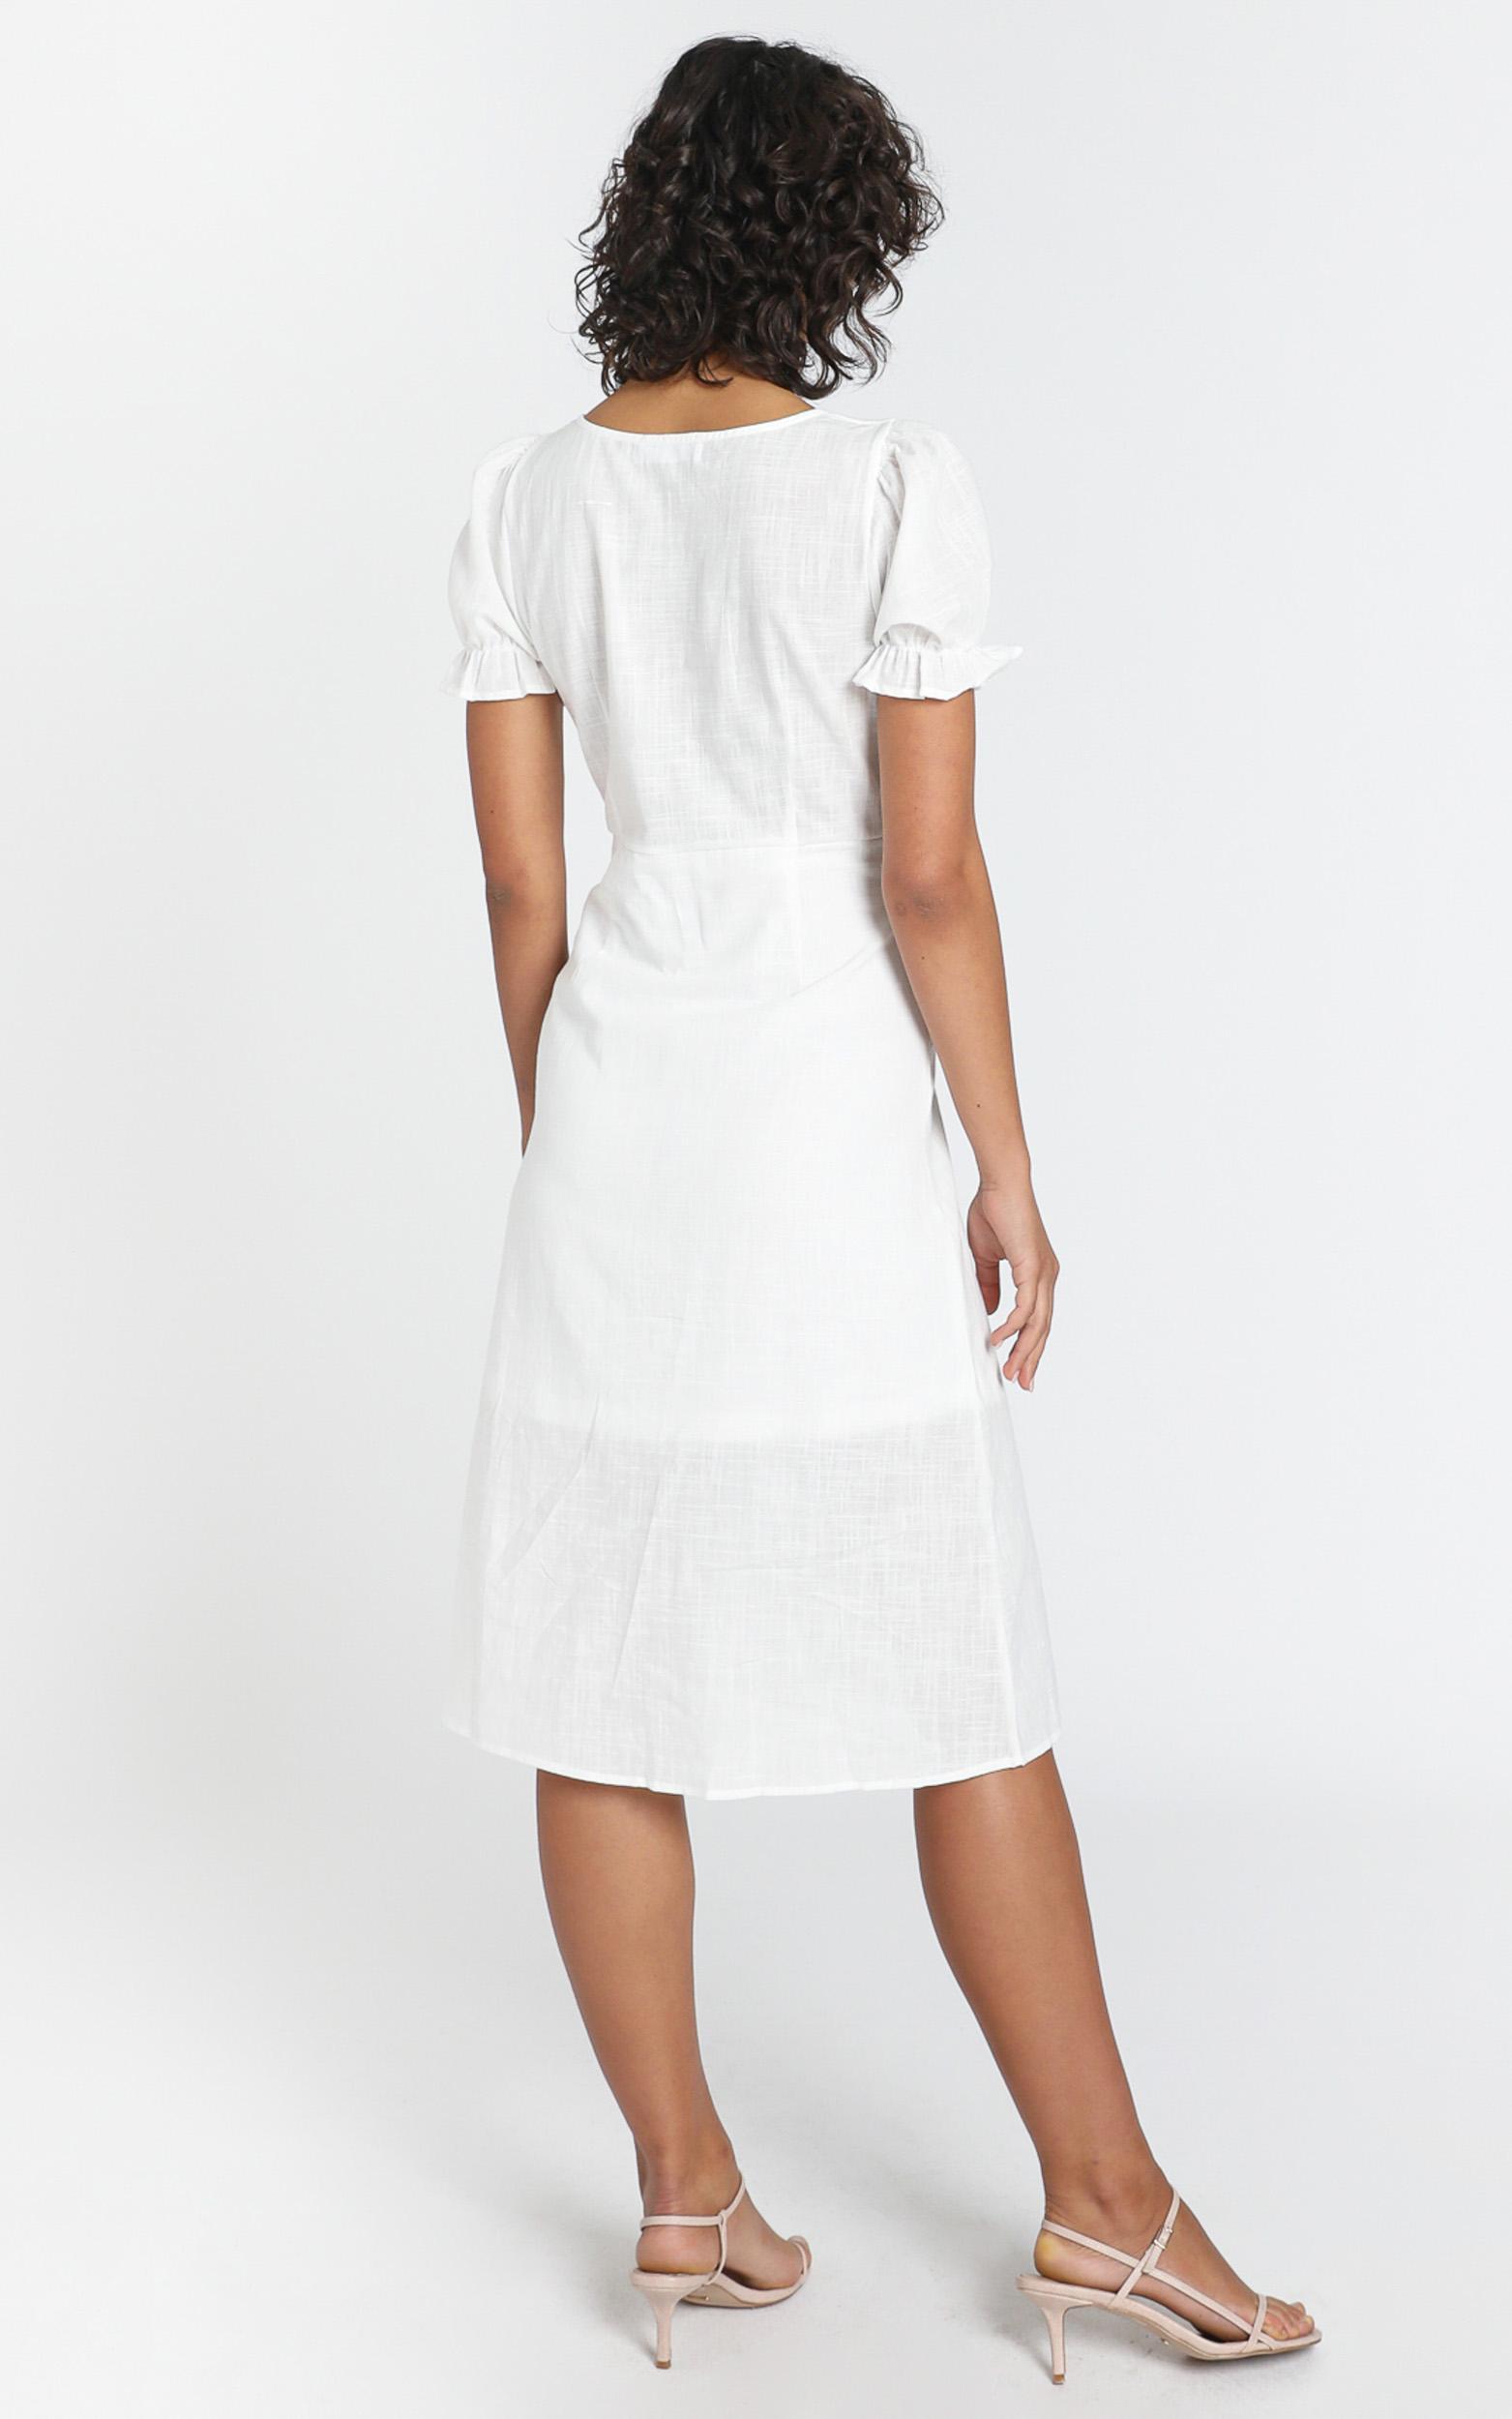 Myra Dress in white - 6 (XS), White, hi-res image number null